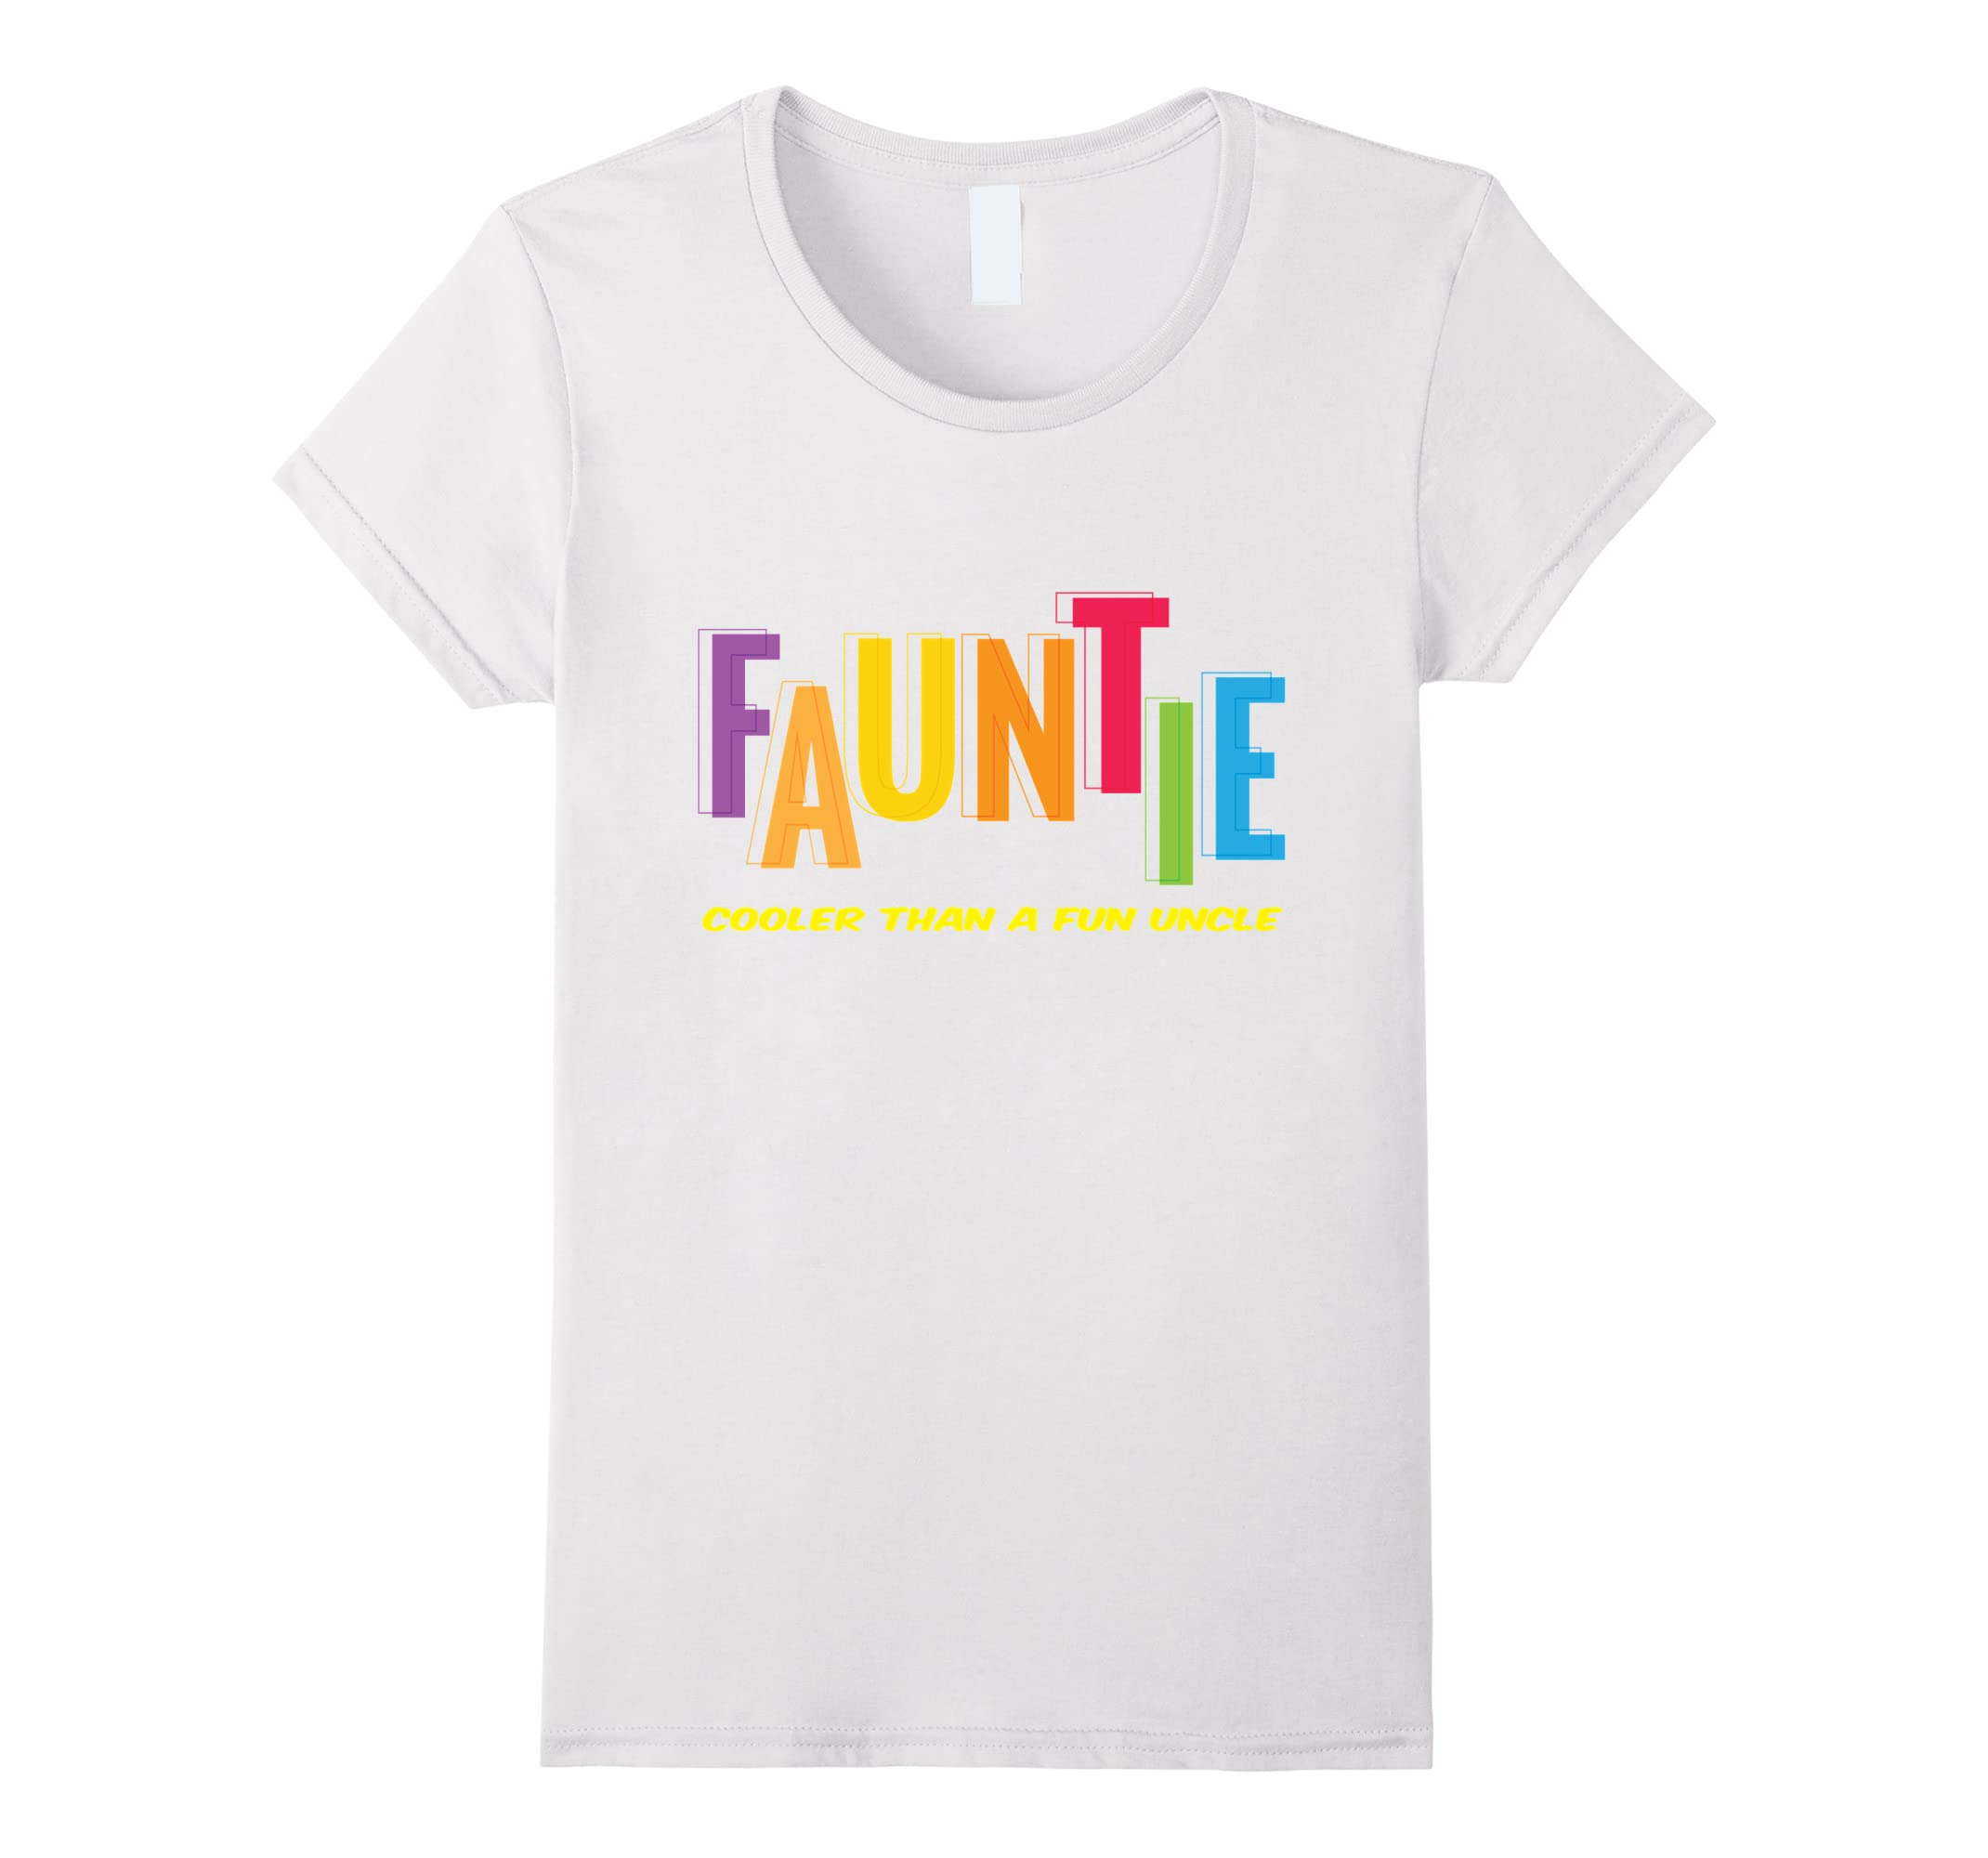 FAUNTIE T Shirt Shirt Cooler Uncle-Colonhue